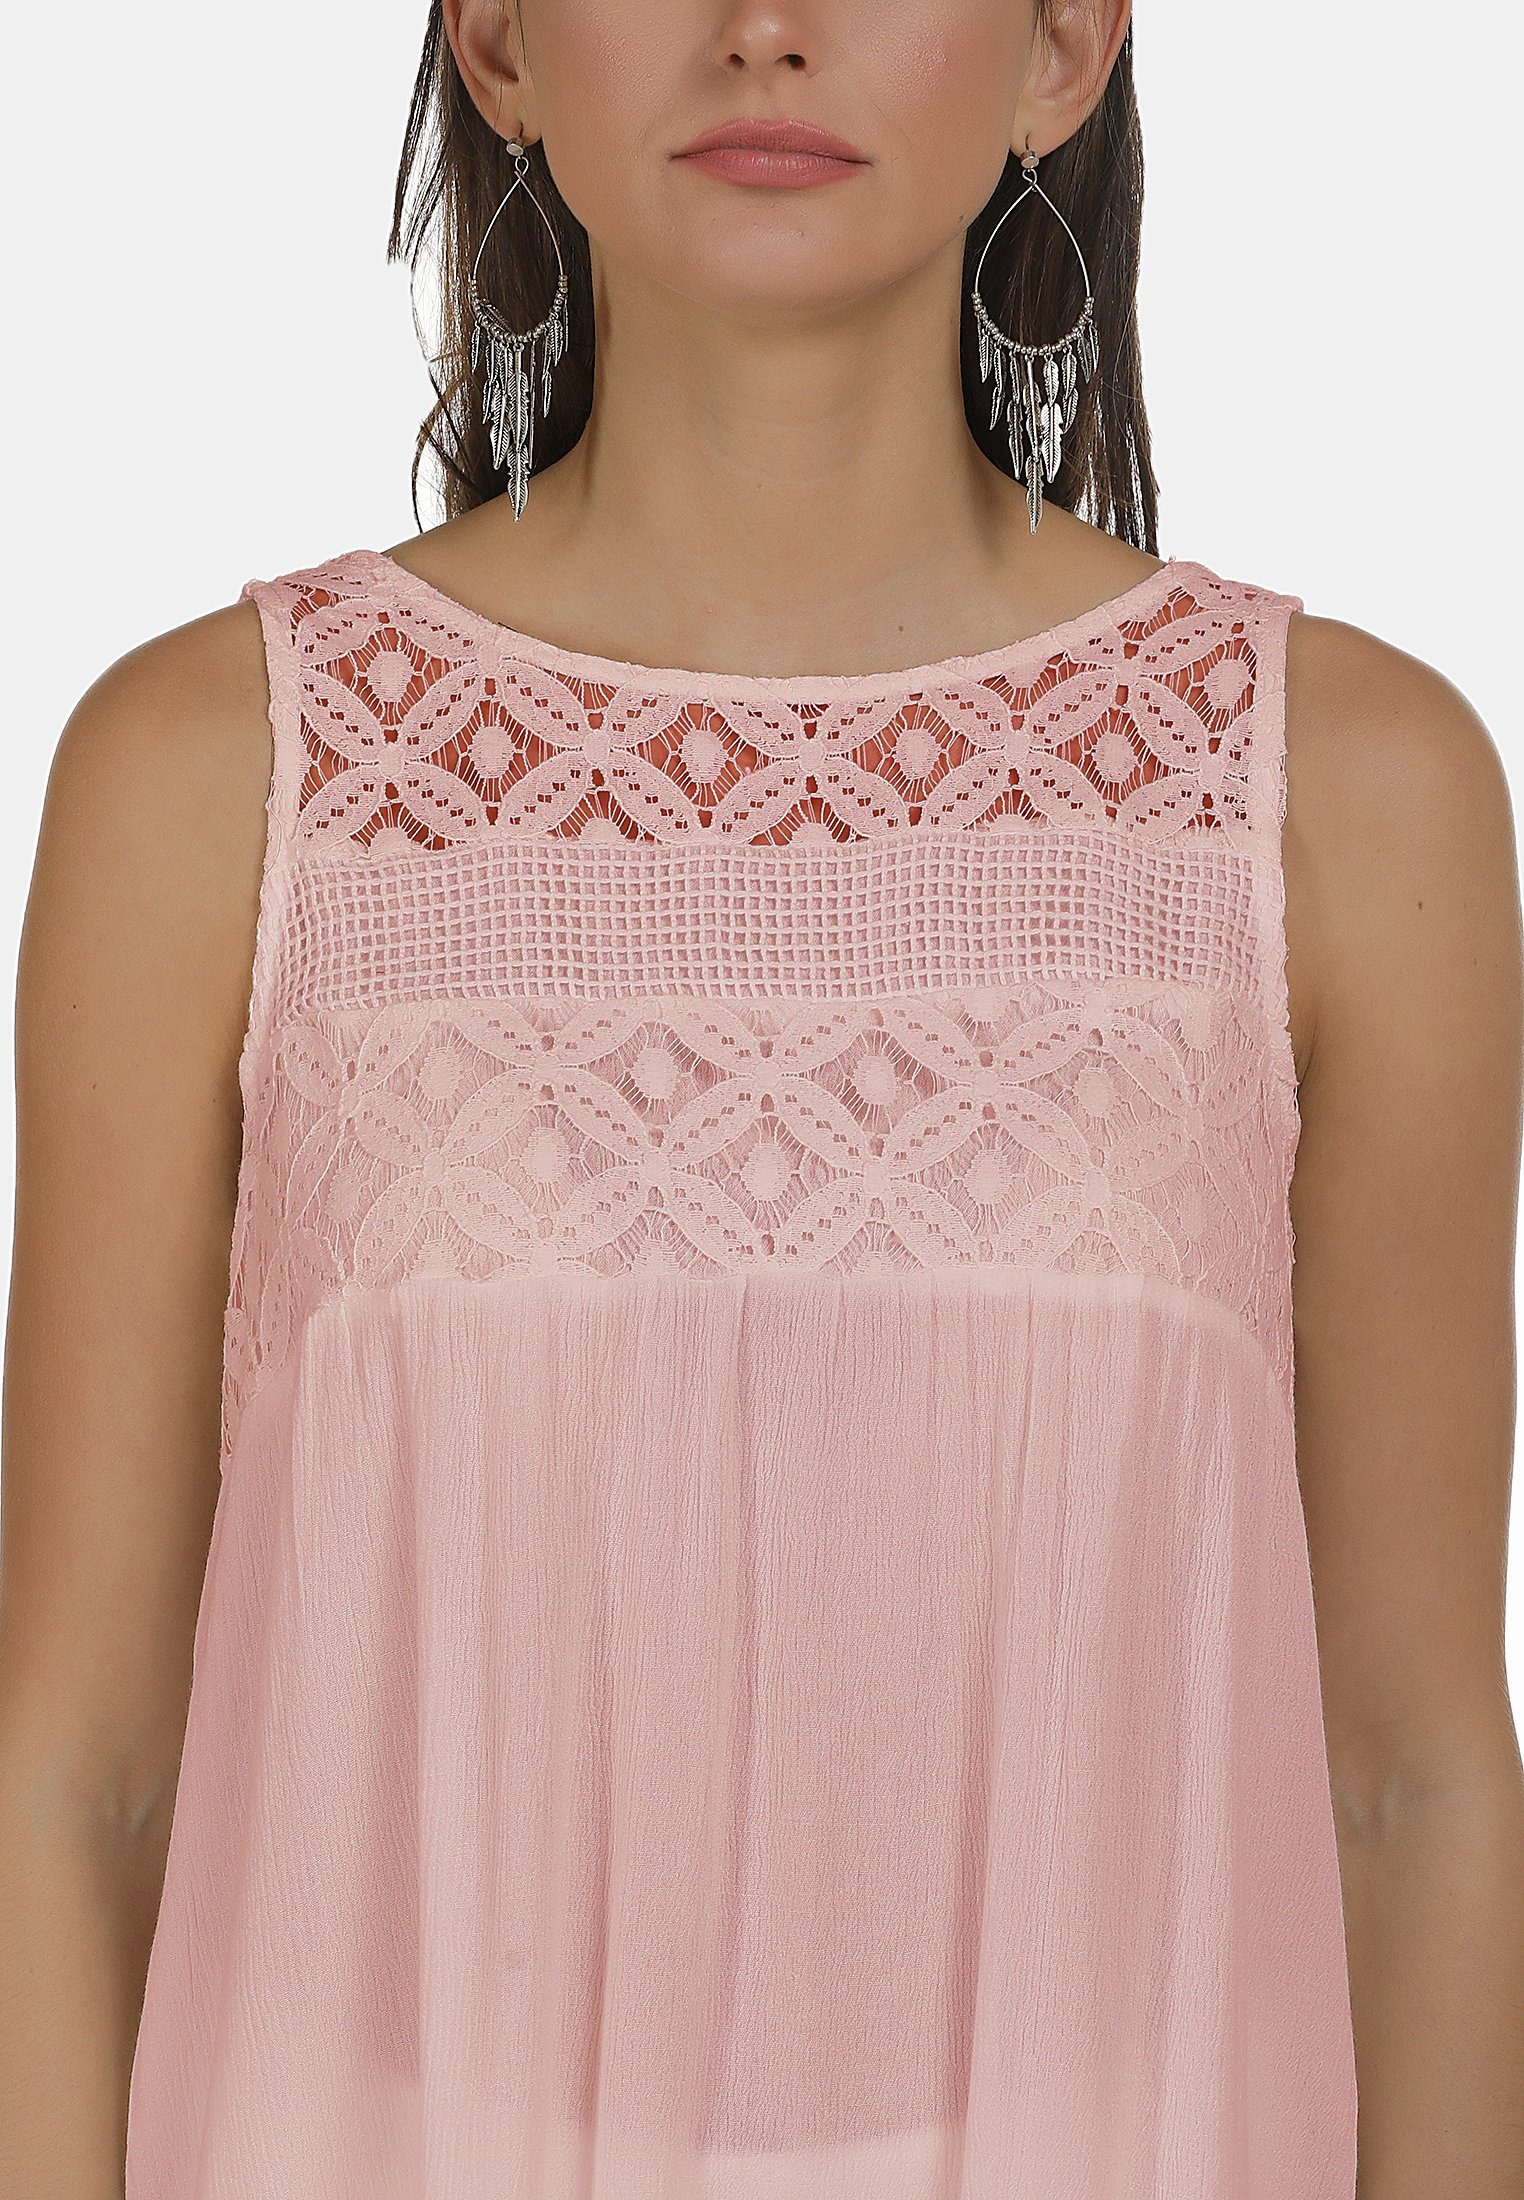 usha Blouse - light pink